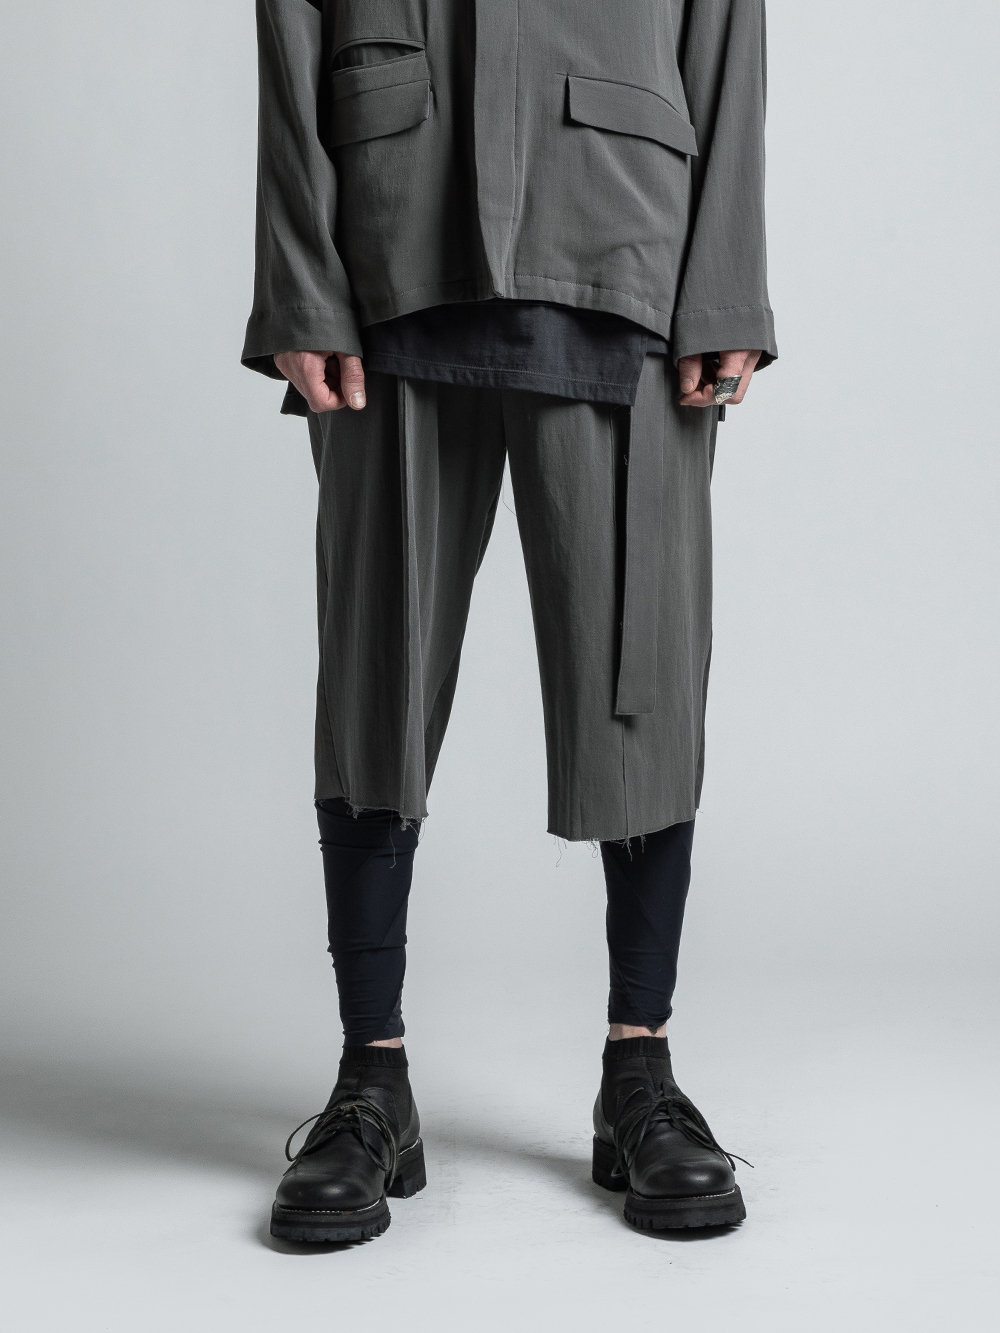 VI-3203-04 / 強撚二重織りコットン七分丈ショーツ